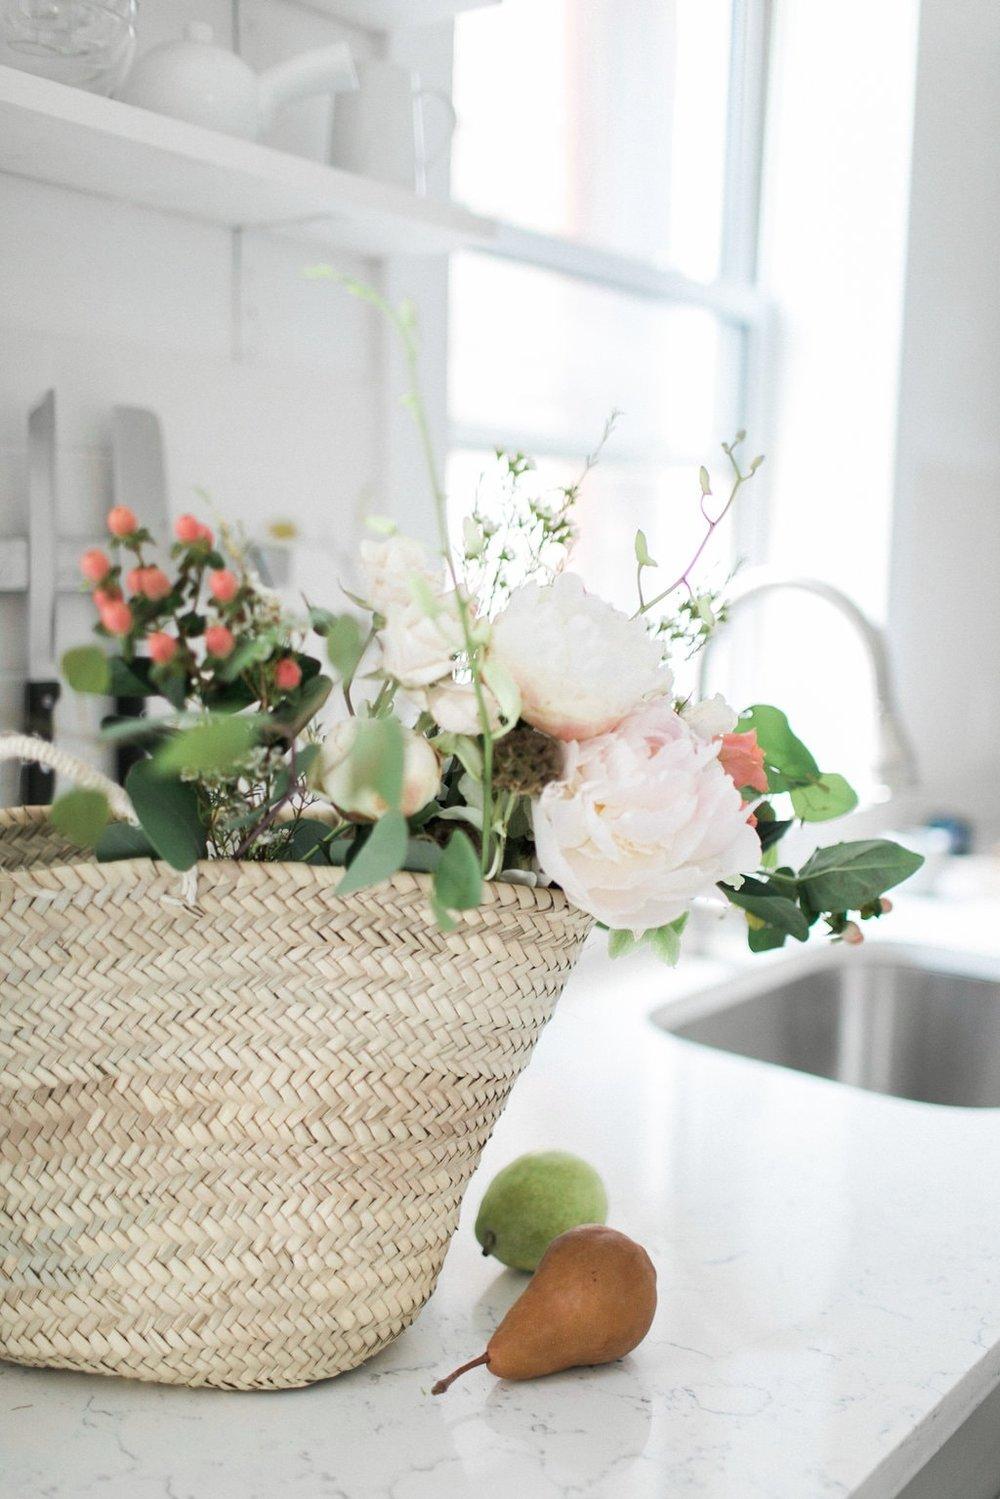 Elegant+Minimal+At-Home+Session+on+Cottage+Hill2.jpg